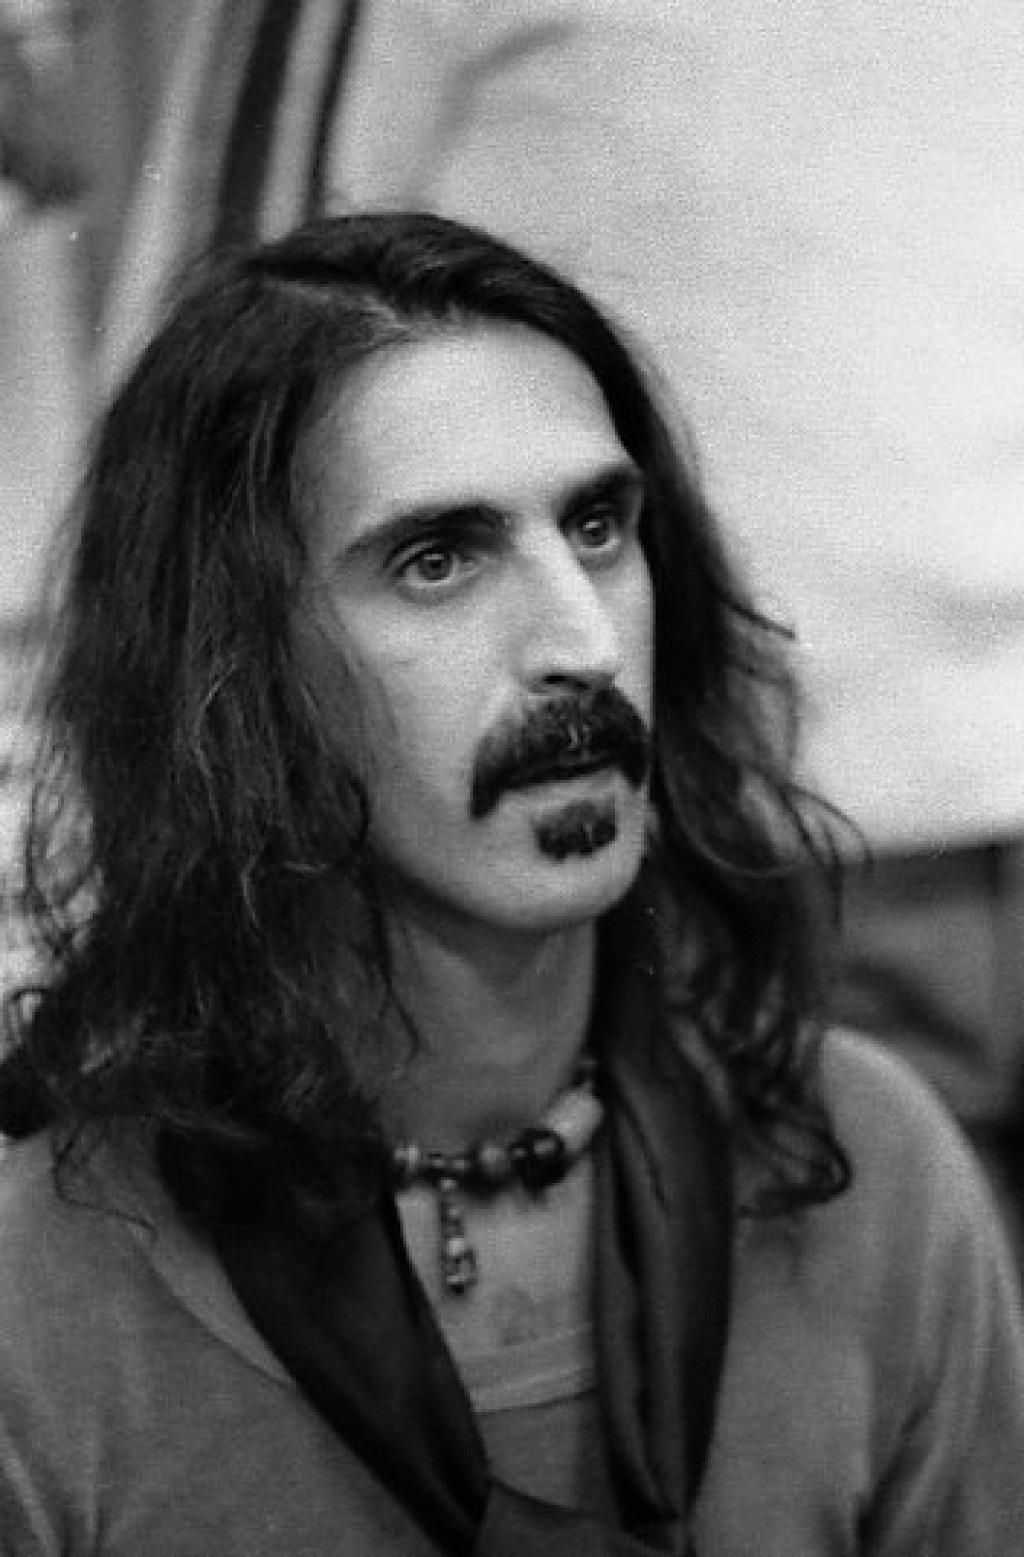 Frank Zappa Happy Birthday in frank zappa flickr | imágenes españoles | frank zappa | pinterest